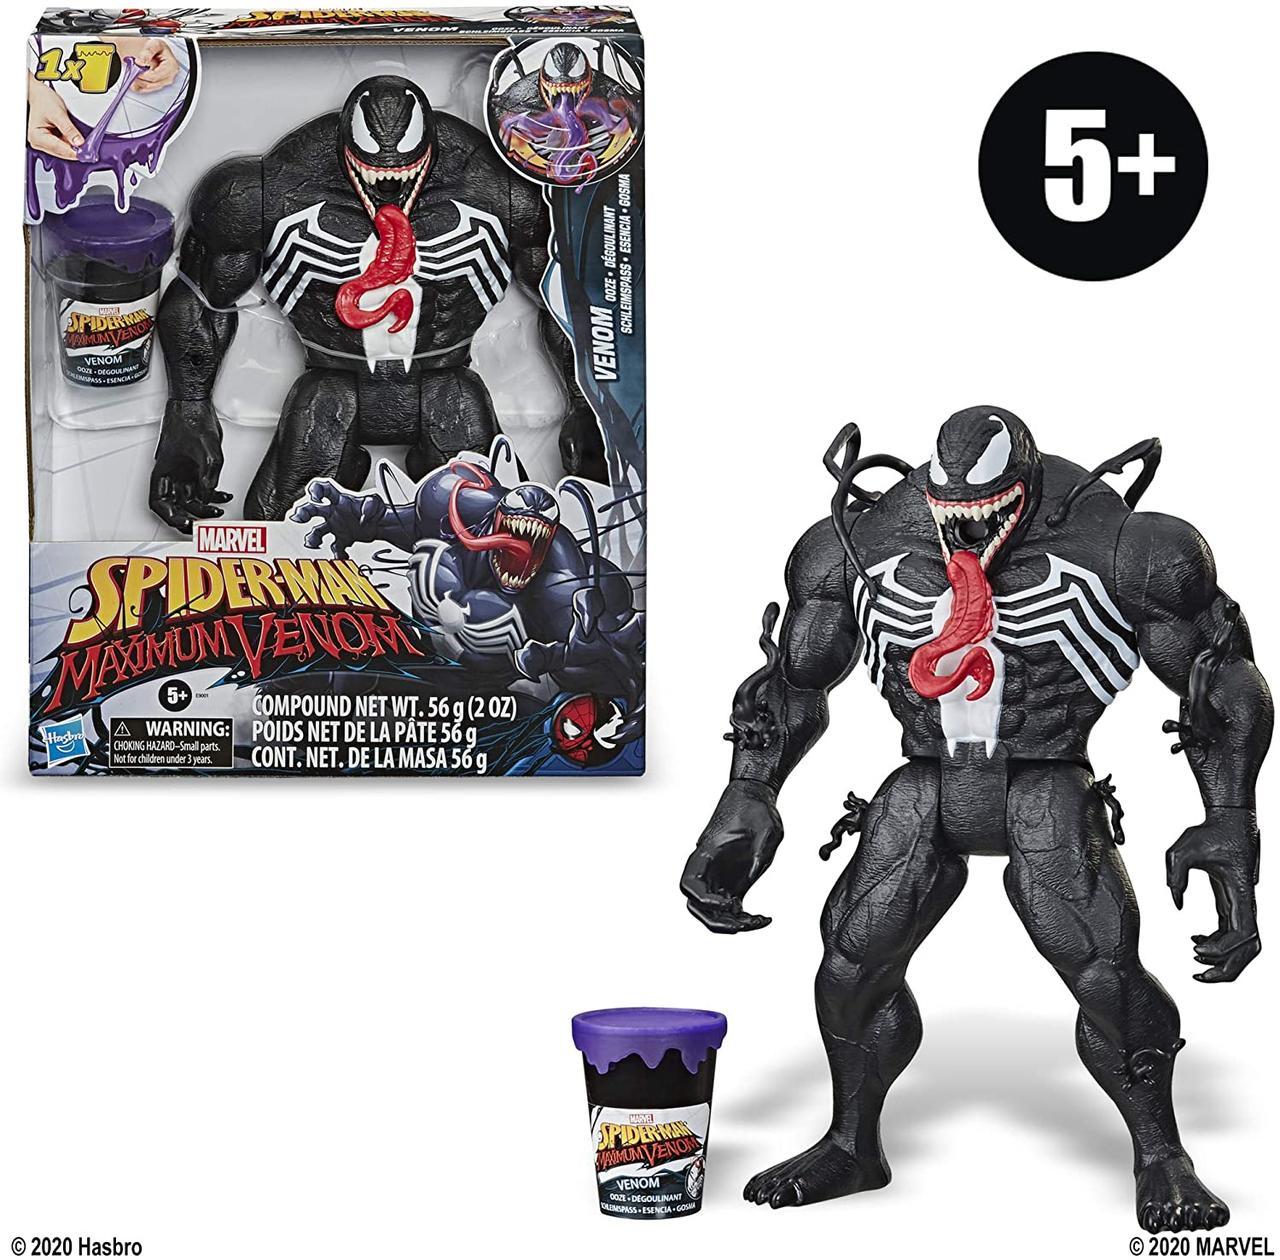 Большая фигурка Веном 30 см со слизью Venom Ooze Figure with Ooze-Slinging Action, Hasbro Оригинал из США